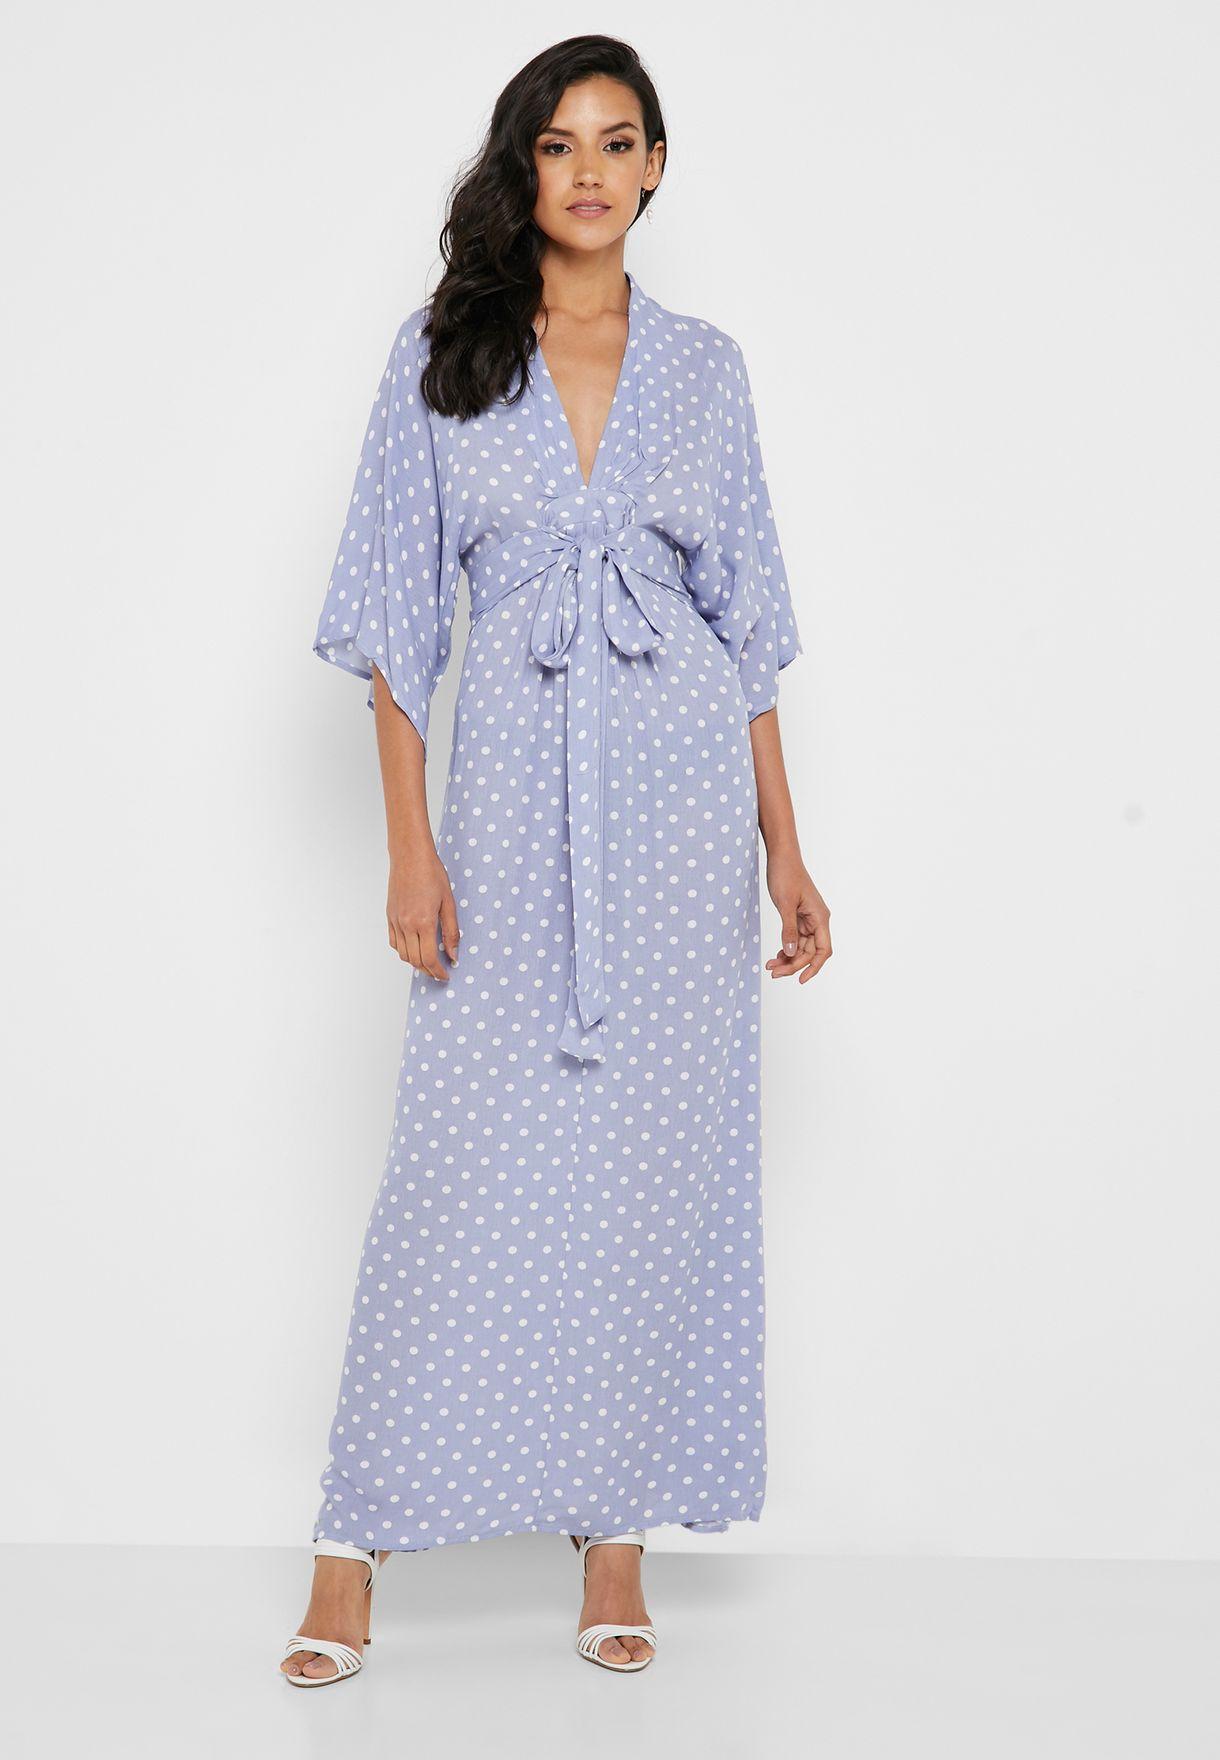 fbd7ad6b7 Shop Ella purple Polka Dot Kimono Sleeve Maxi Dress NL4822B for ...